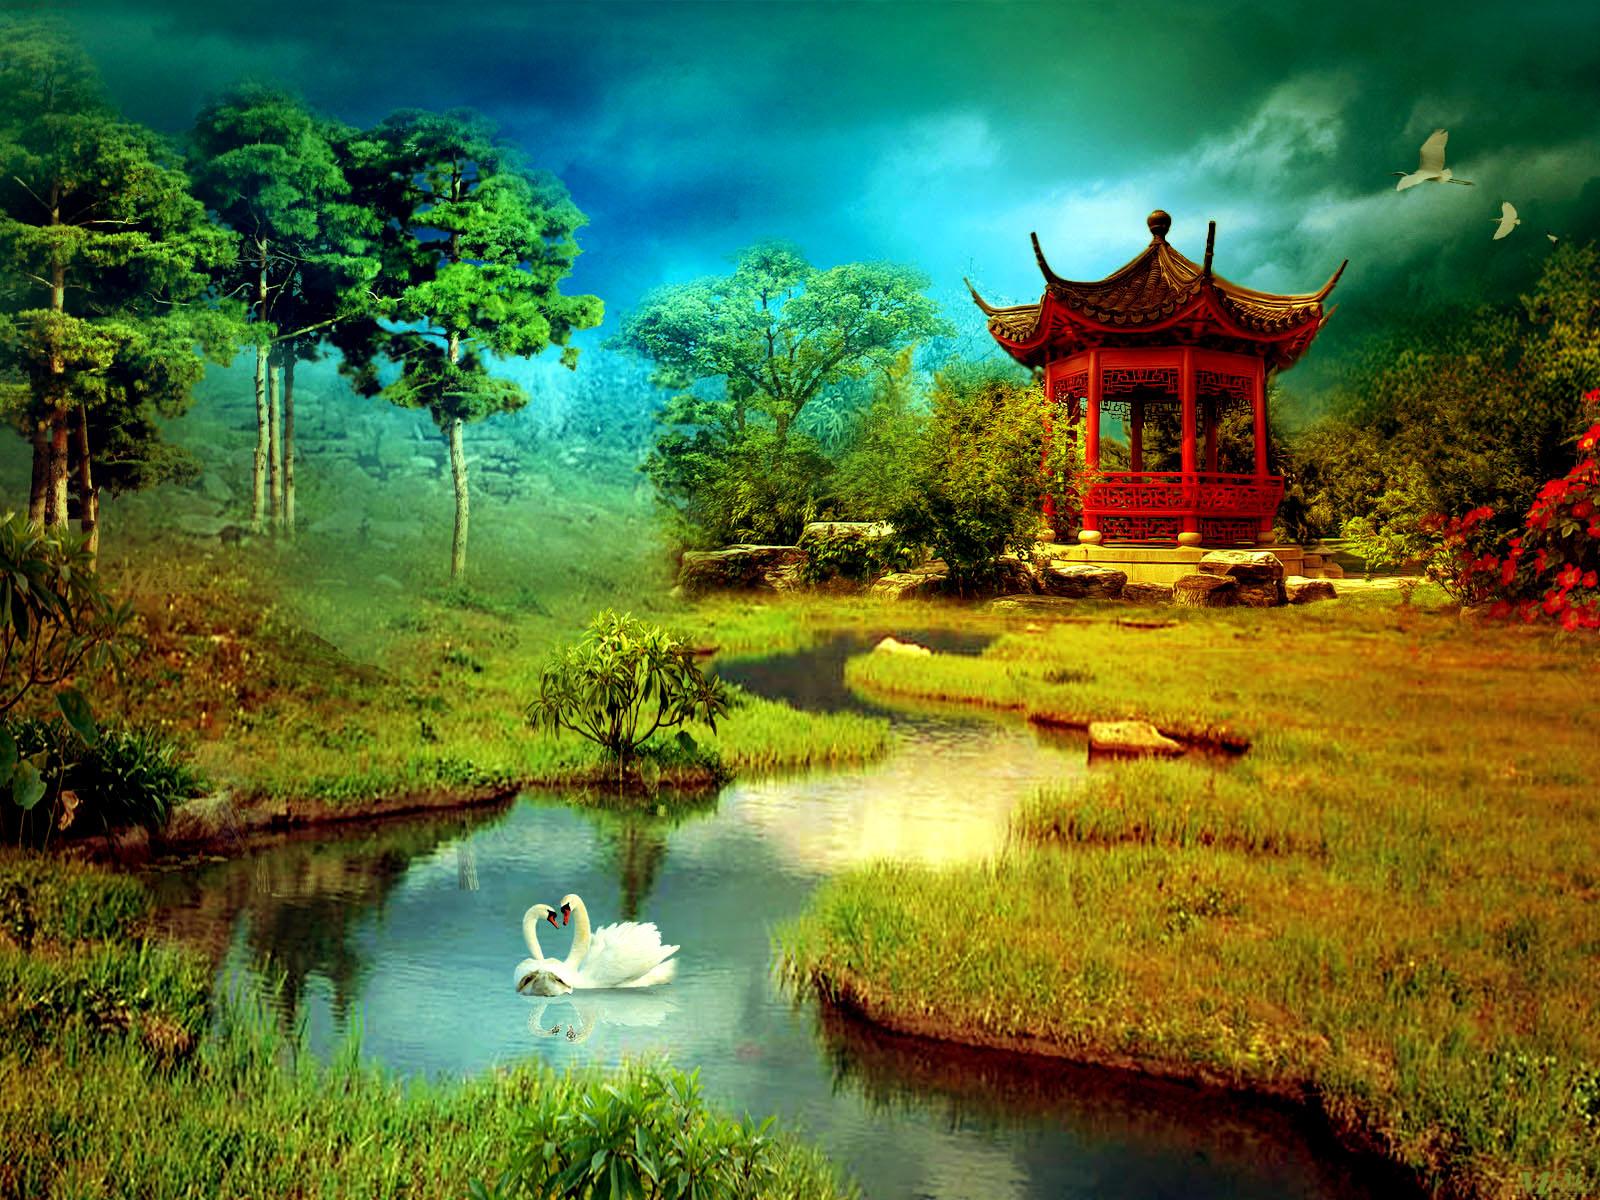 Nature Digital Art Wallpapers   1600x1200   489598 1600x1200